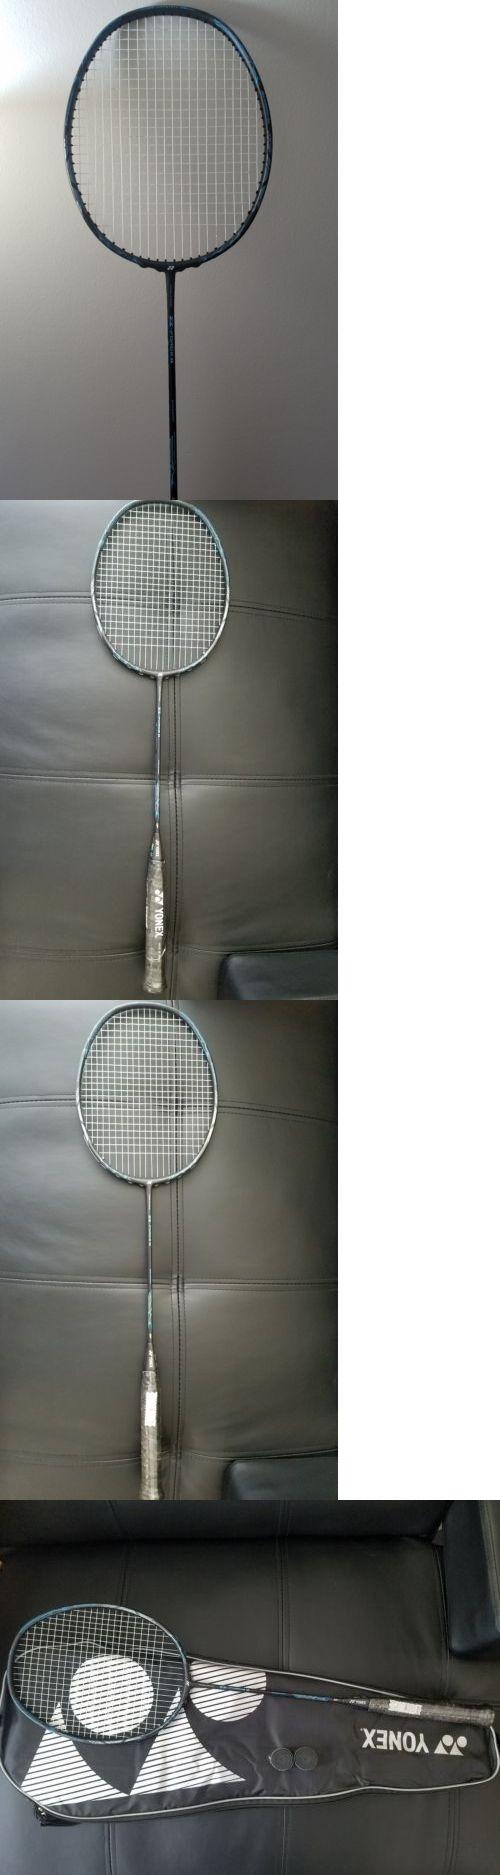 Badminton 106460: Yonex Voltric Z-Force 2 4U, Badminton Racquet Racket -> BUY IT NOW ONLY: $180 on eBay!